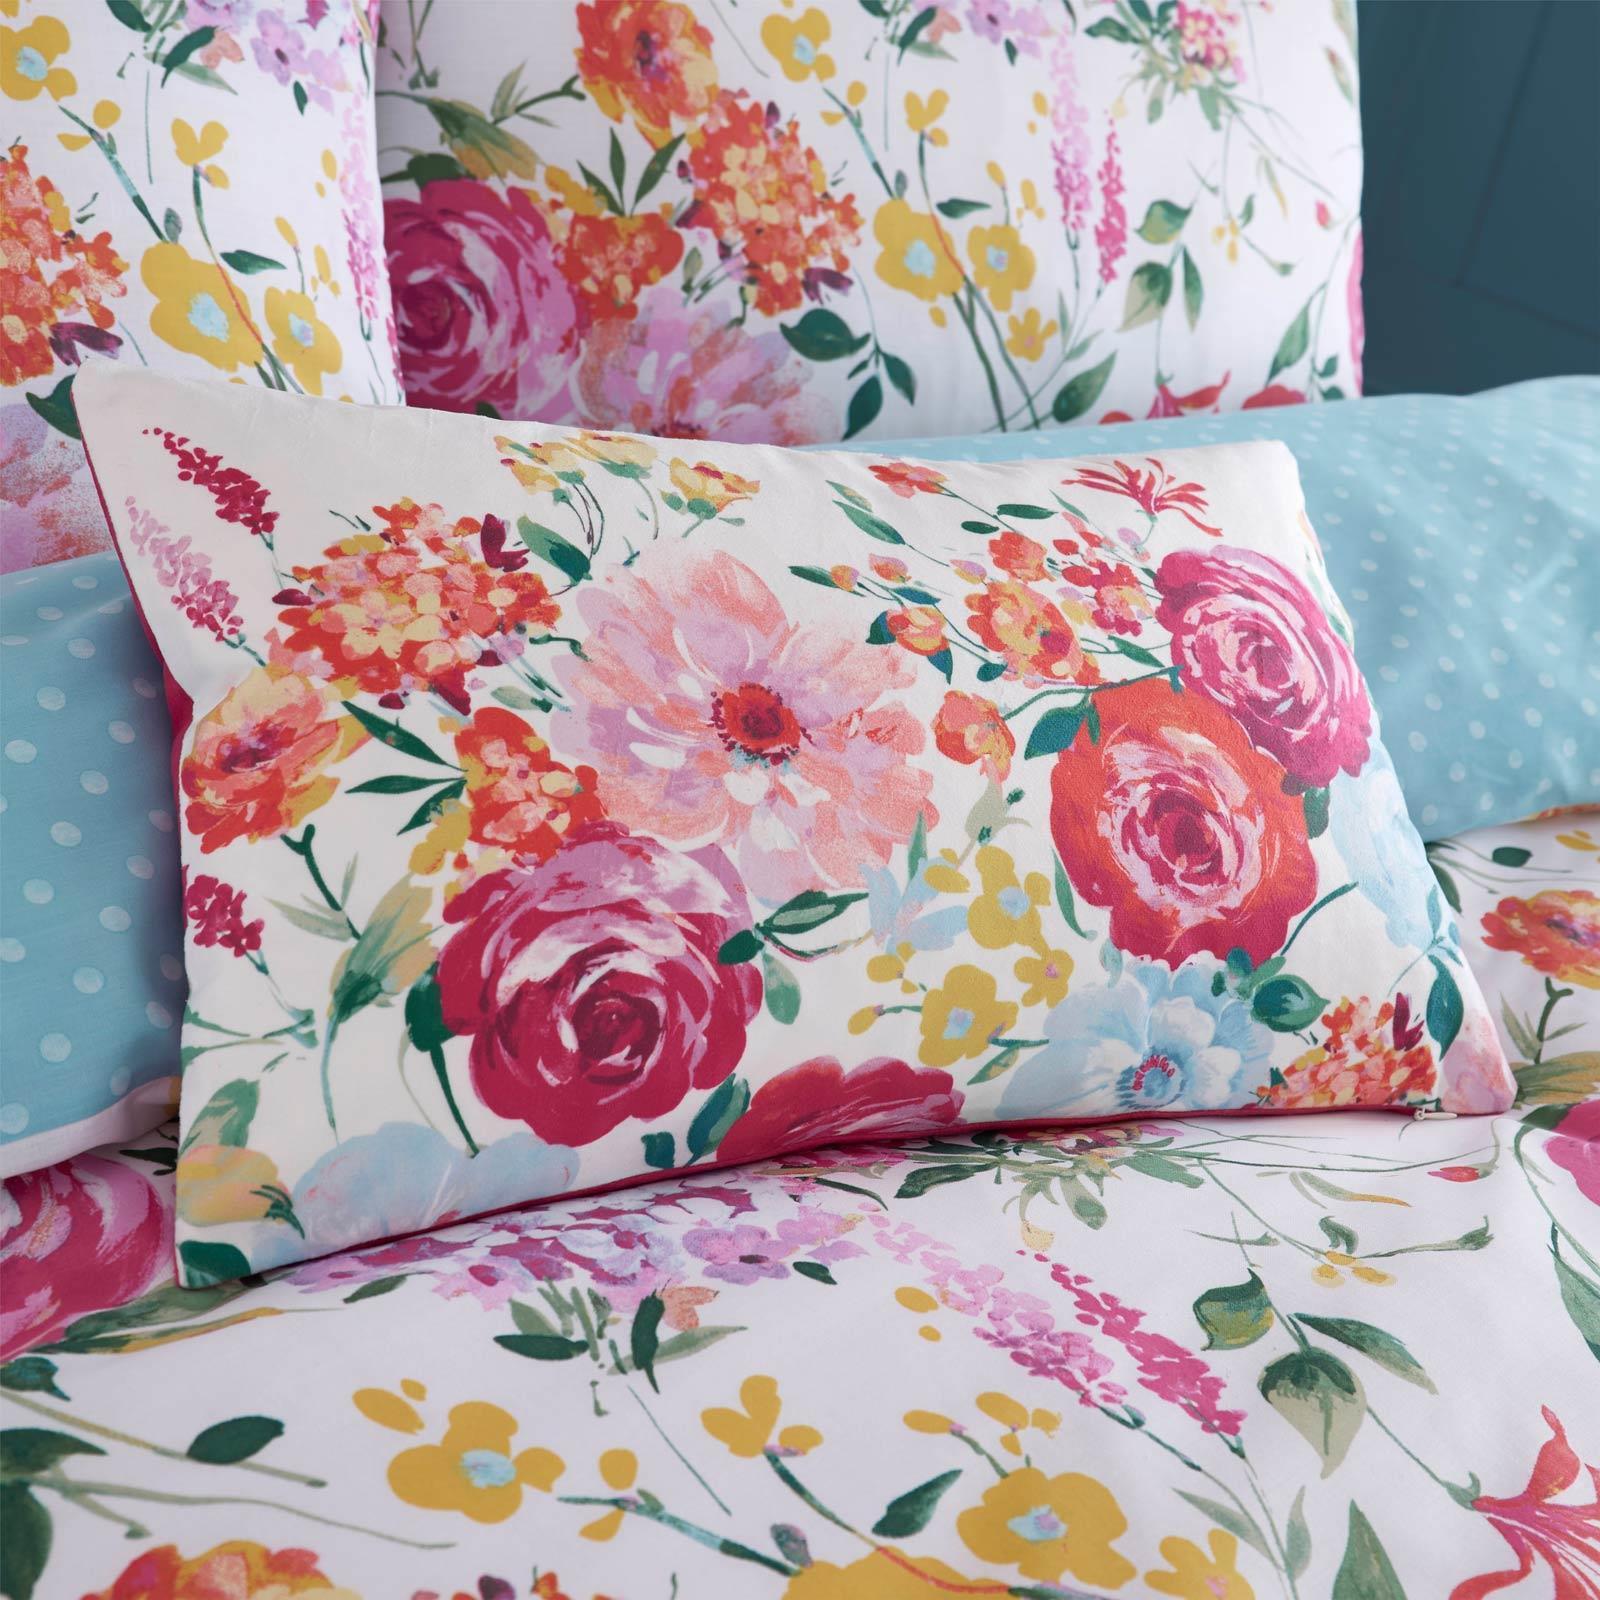 Catherine-Lansfield-Salisbury-Pink-cubierta-del-edredon-edredon-cubre-floral-de-conjuntos-de-cama miniatura 18